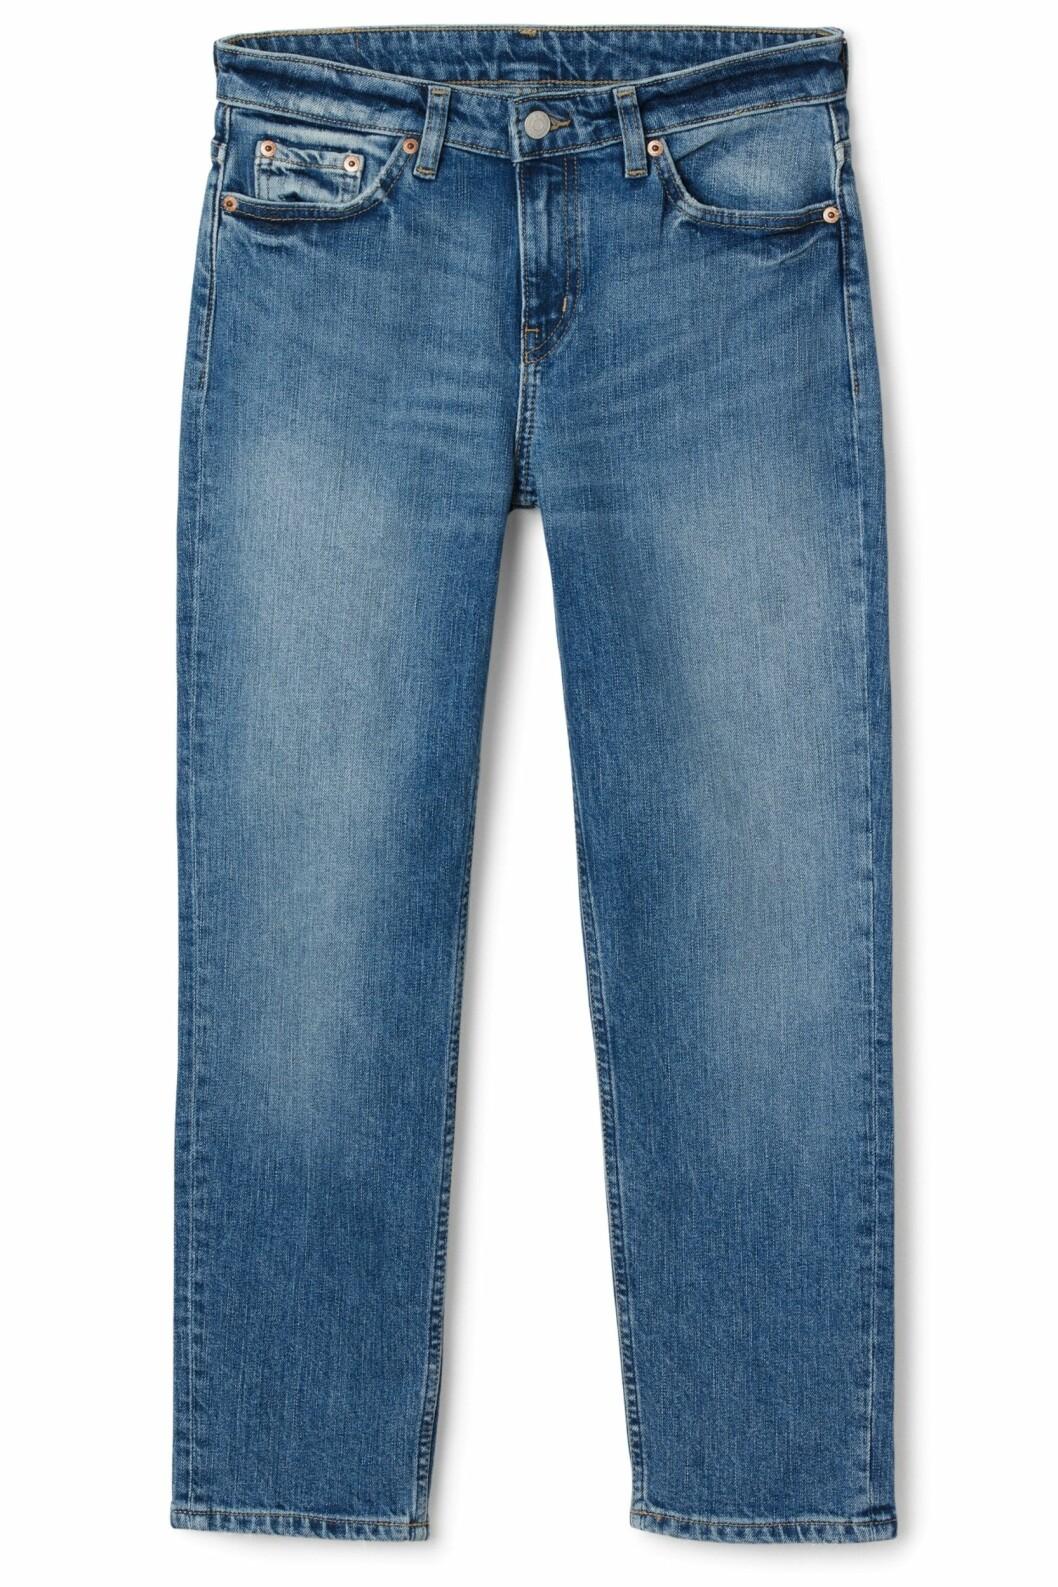 Jeans fra Weekday, kr 500. Foto: Produsenten